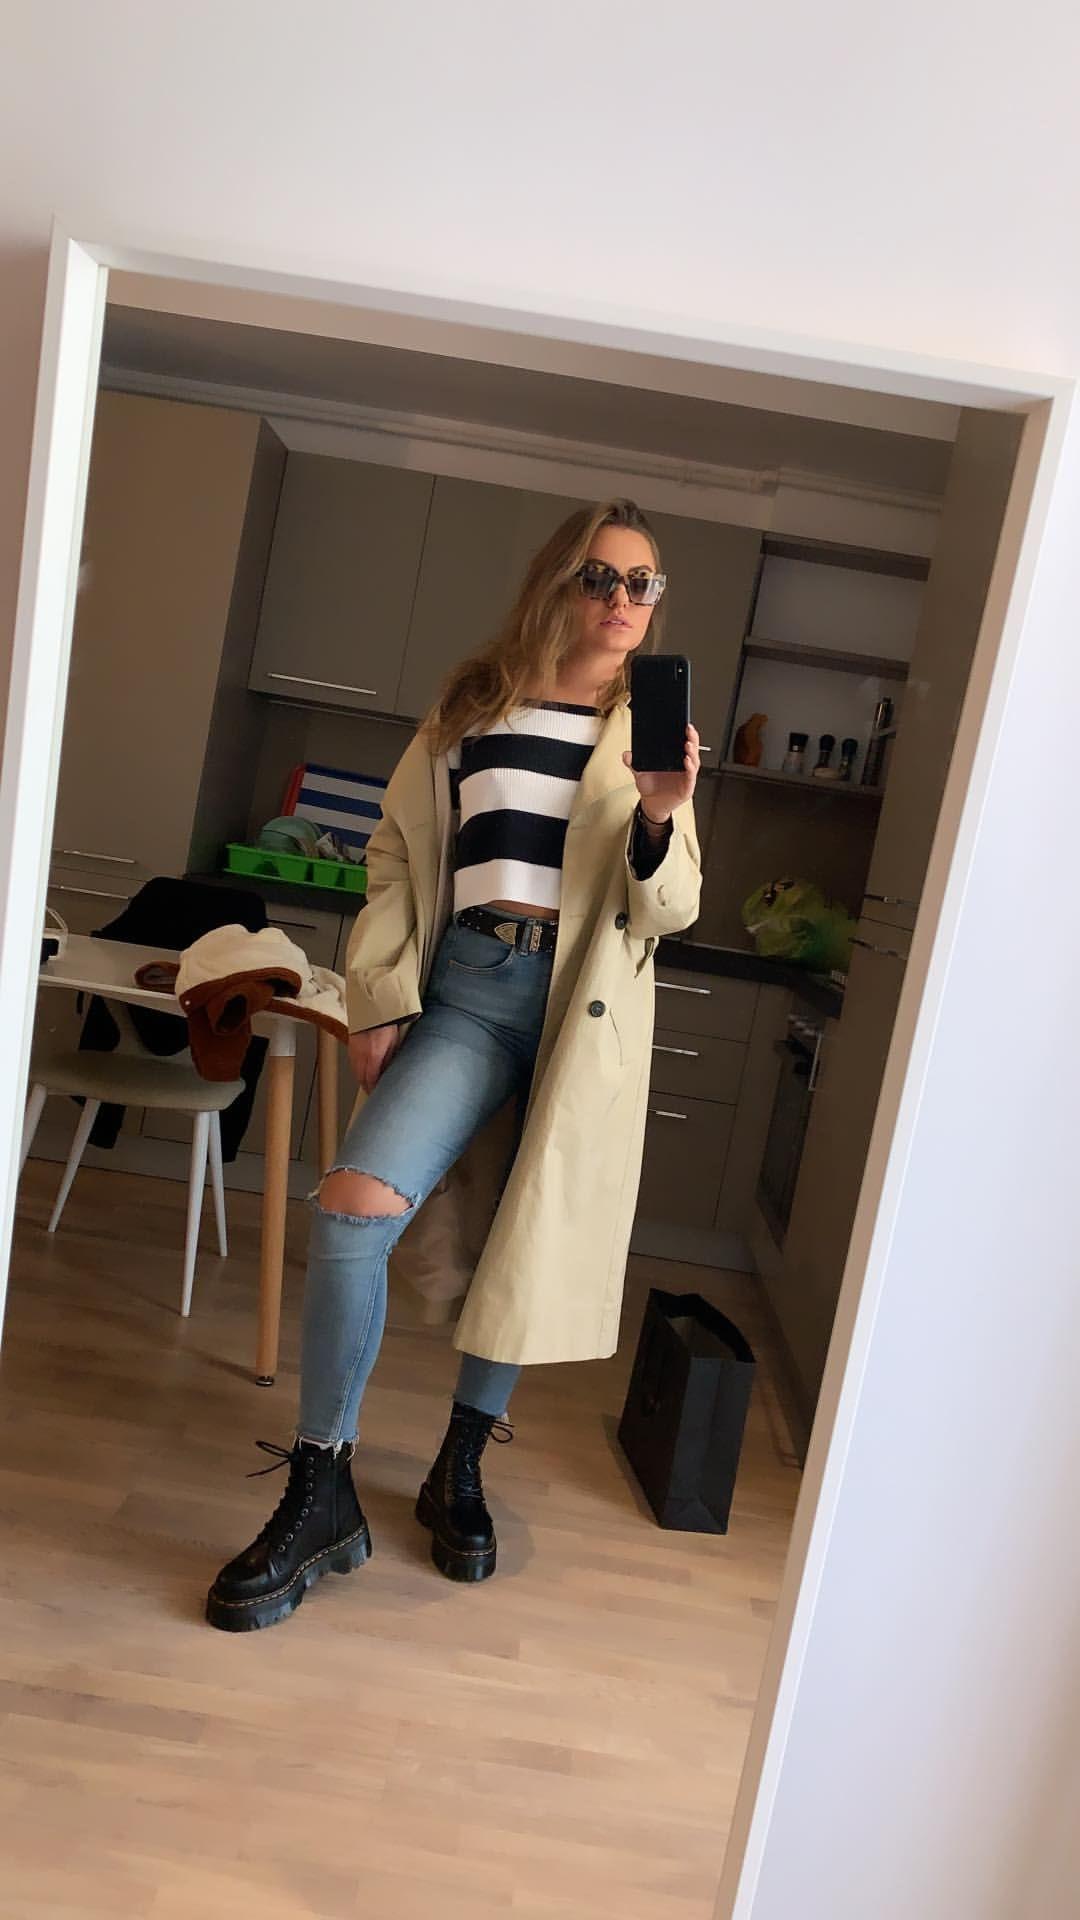 Pin By Lauren White On Alexandra Stan In 2019 Alexandra Stan